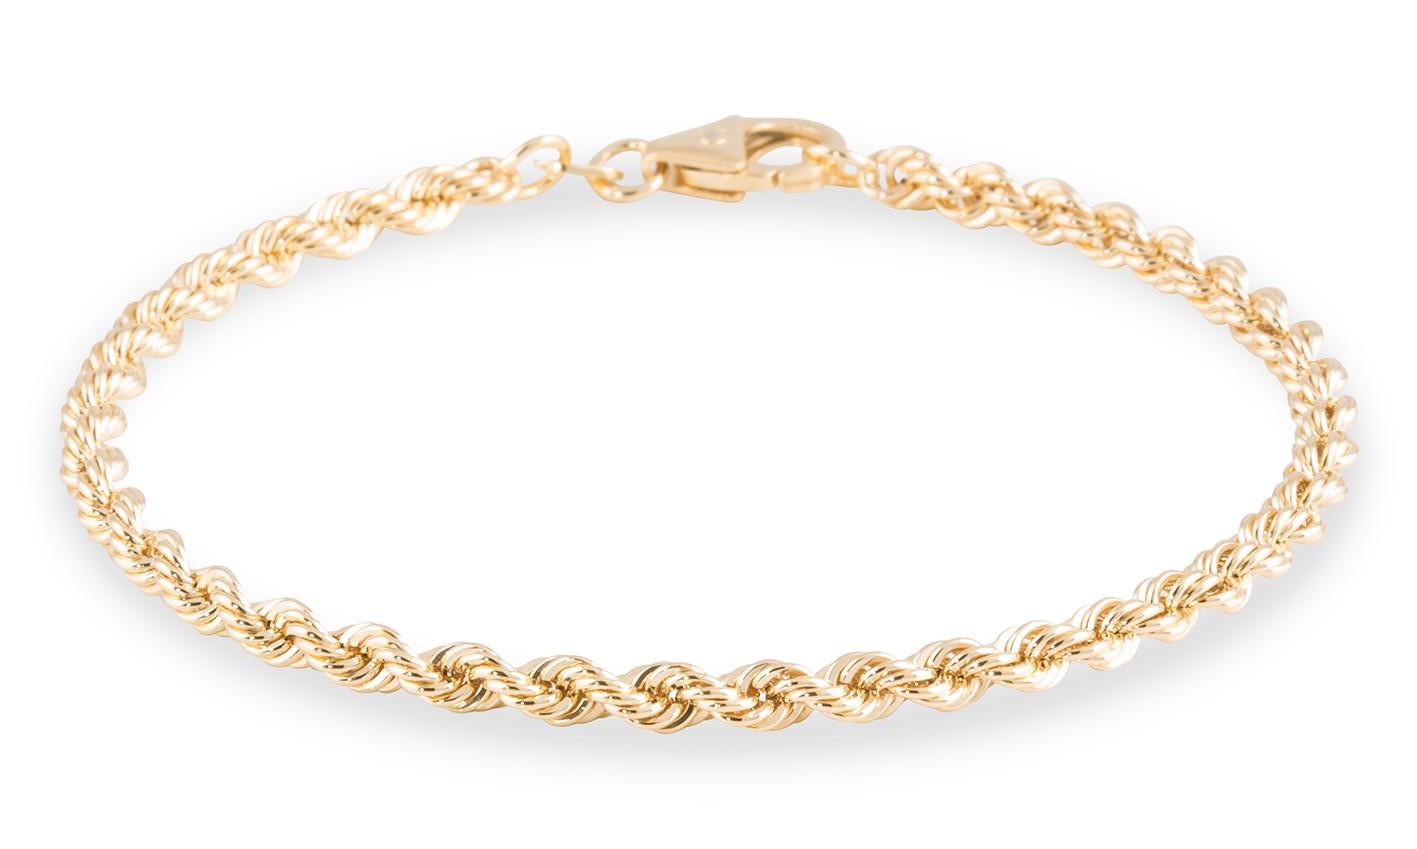 Gouden Armband Koord 19 cm x 3.2 mm 204.2014.19